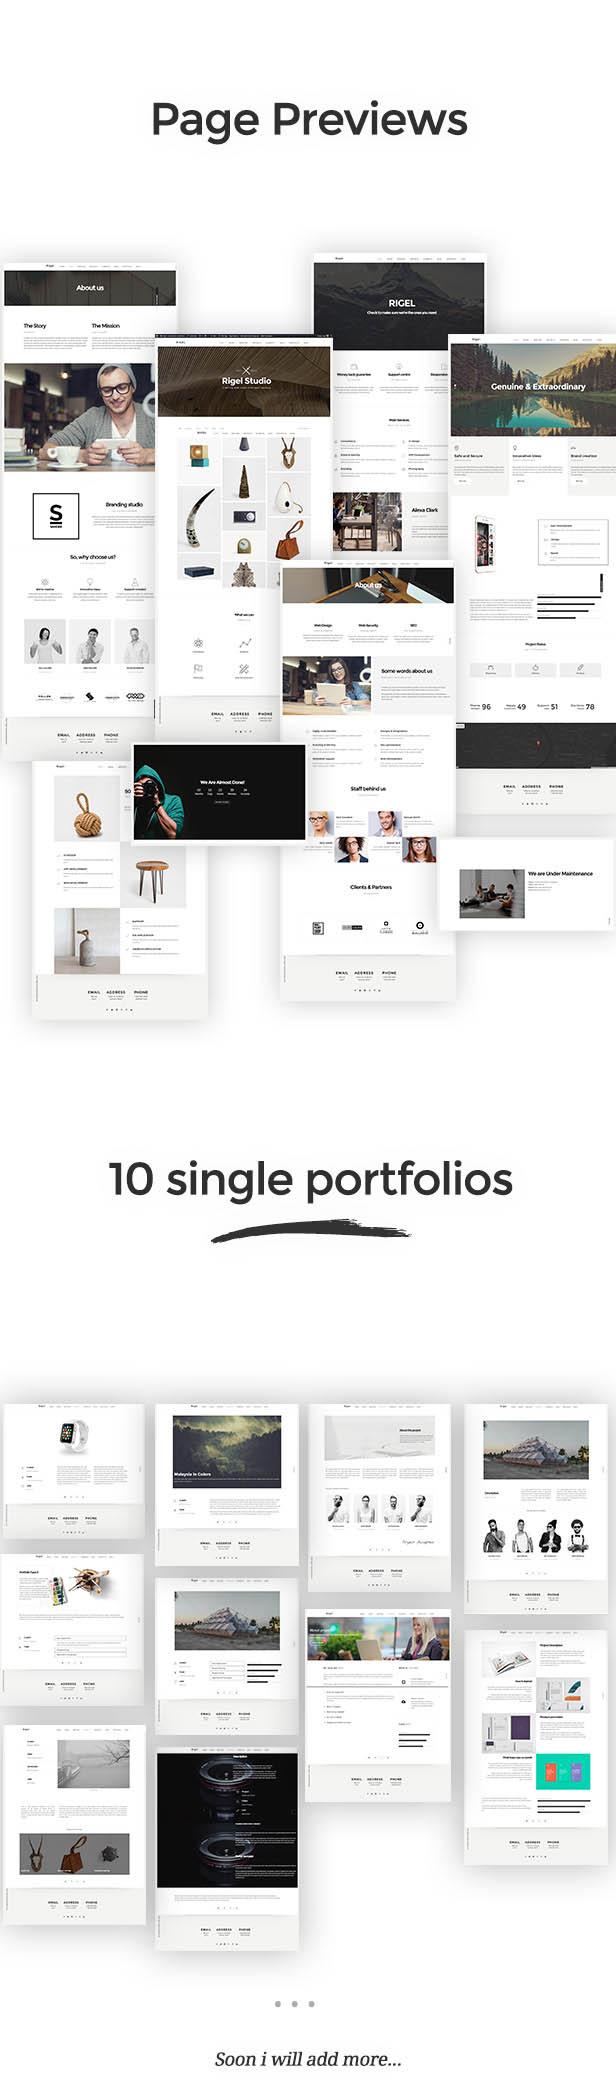 Rigel - Ultimate Agency & Portfolio Theme - 3